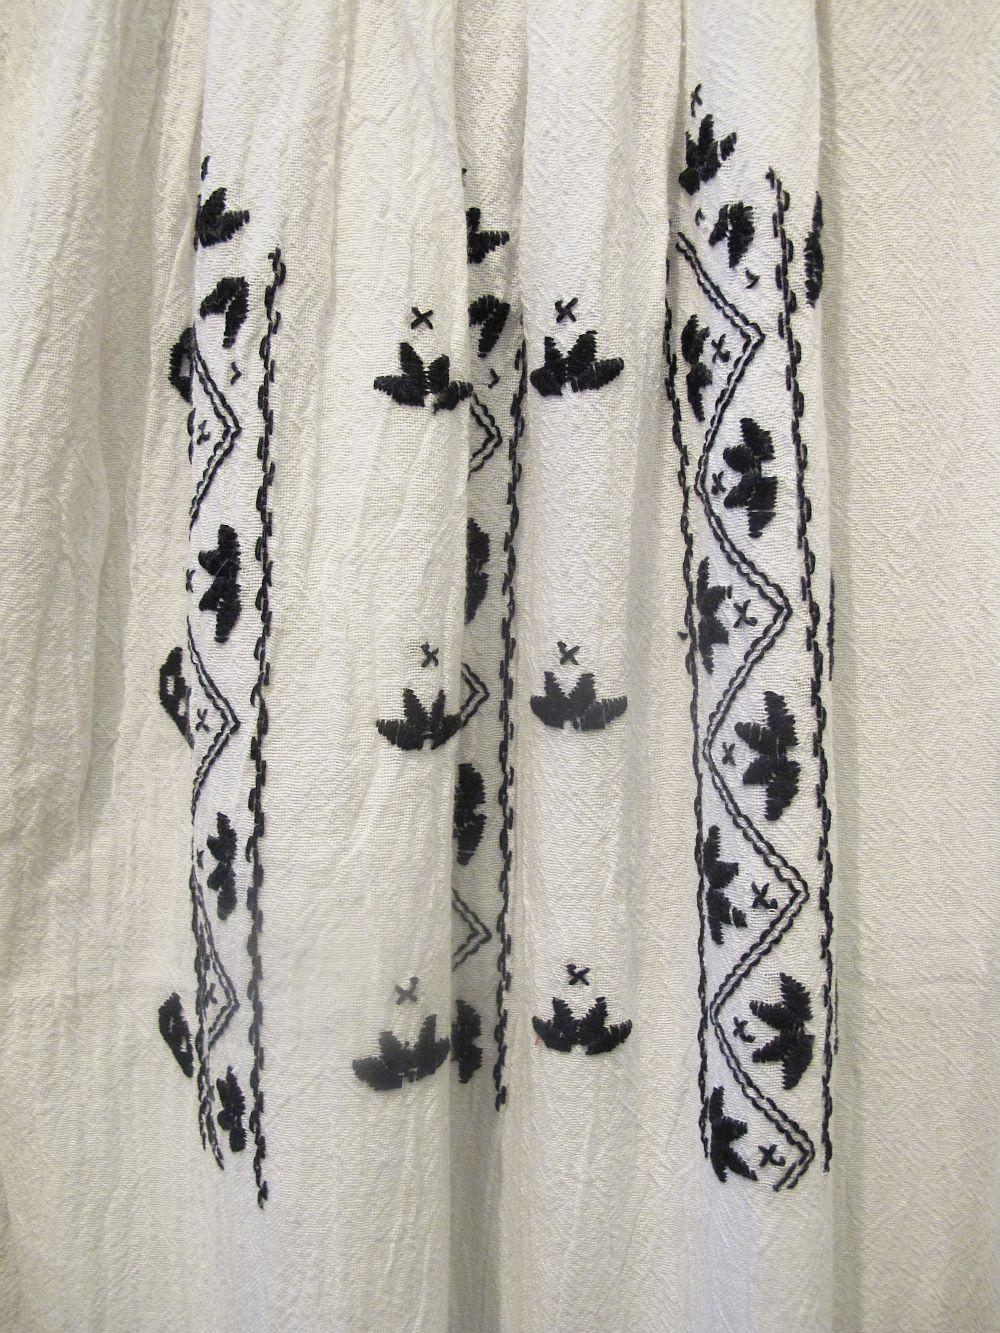 adelaparvu.com about Doina Nistor dolls artisan (7)